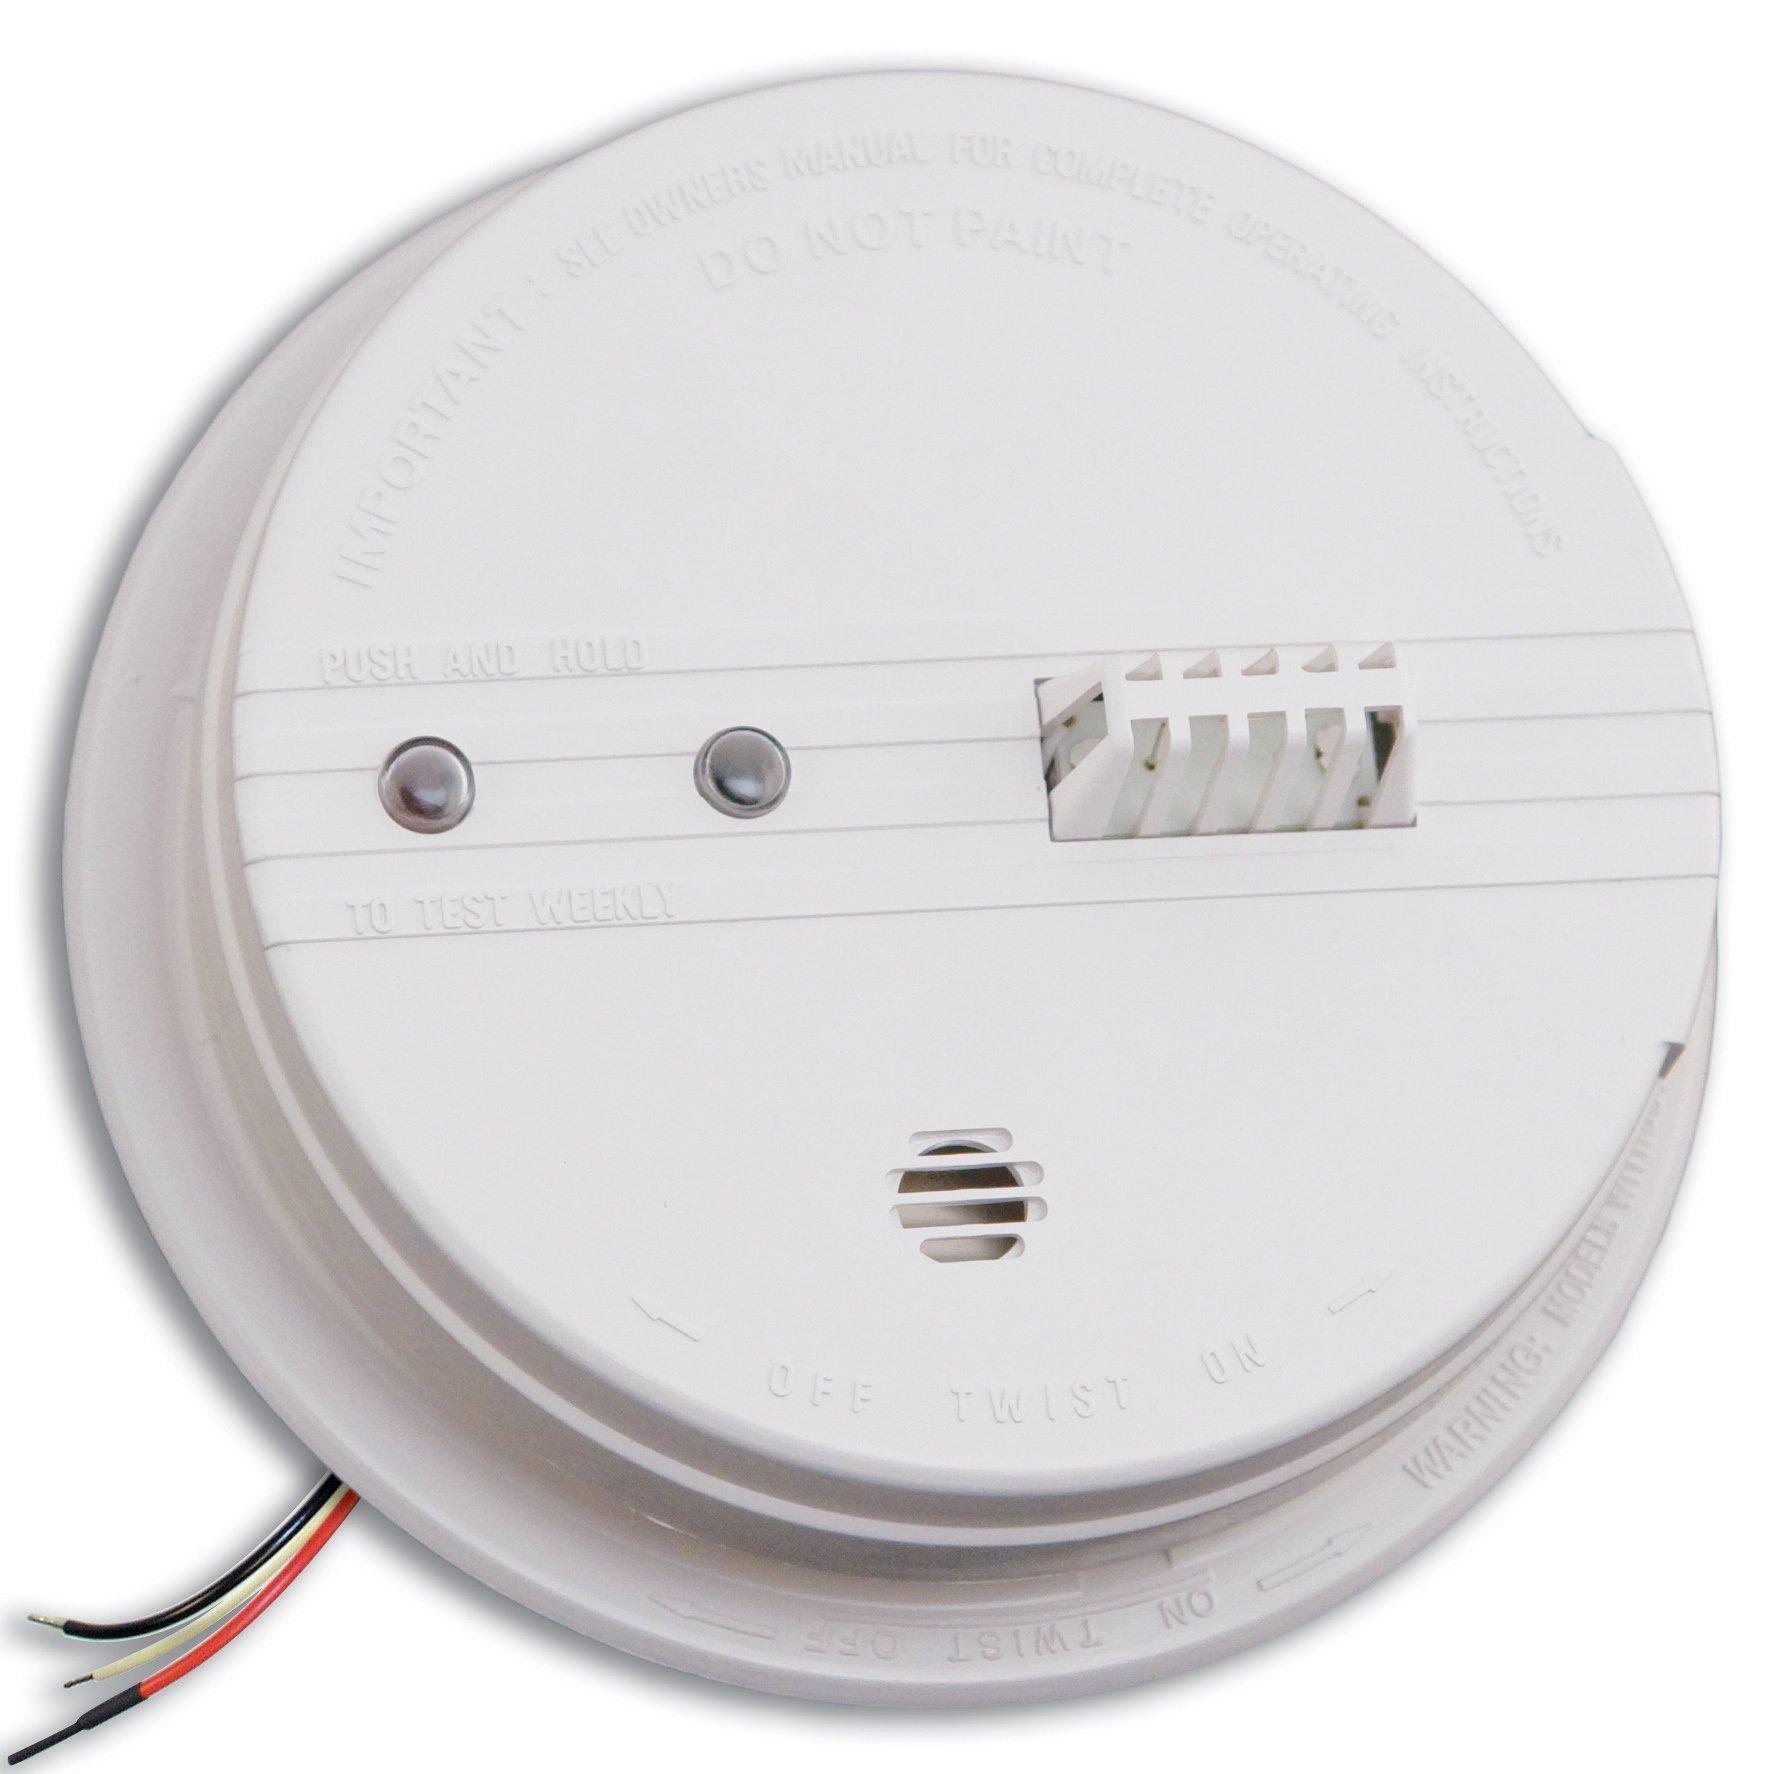 Kidde HD135F Fyrnetics Hardwire Heat Detector with Battery Backup product  image